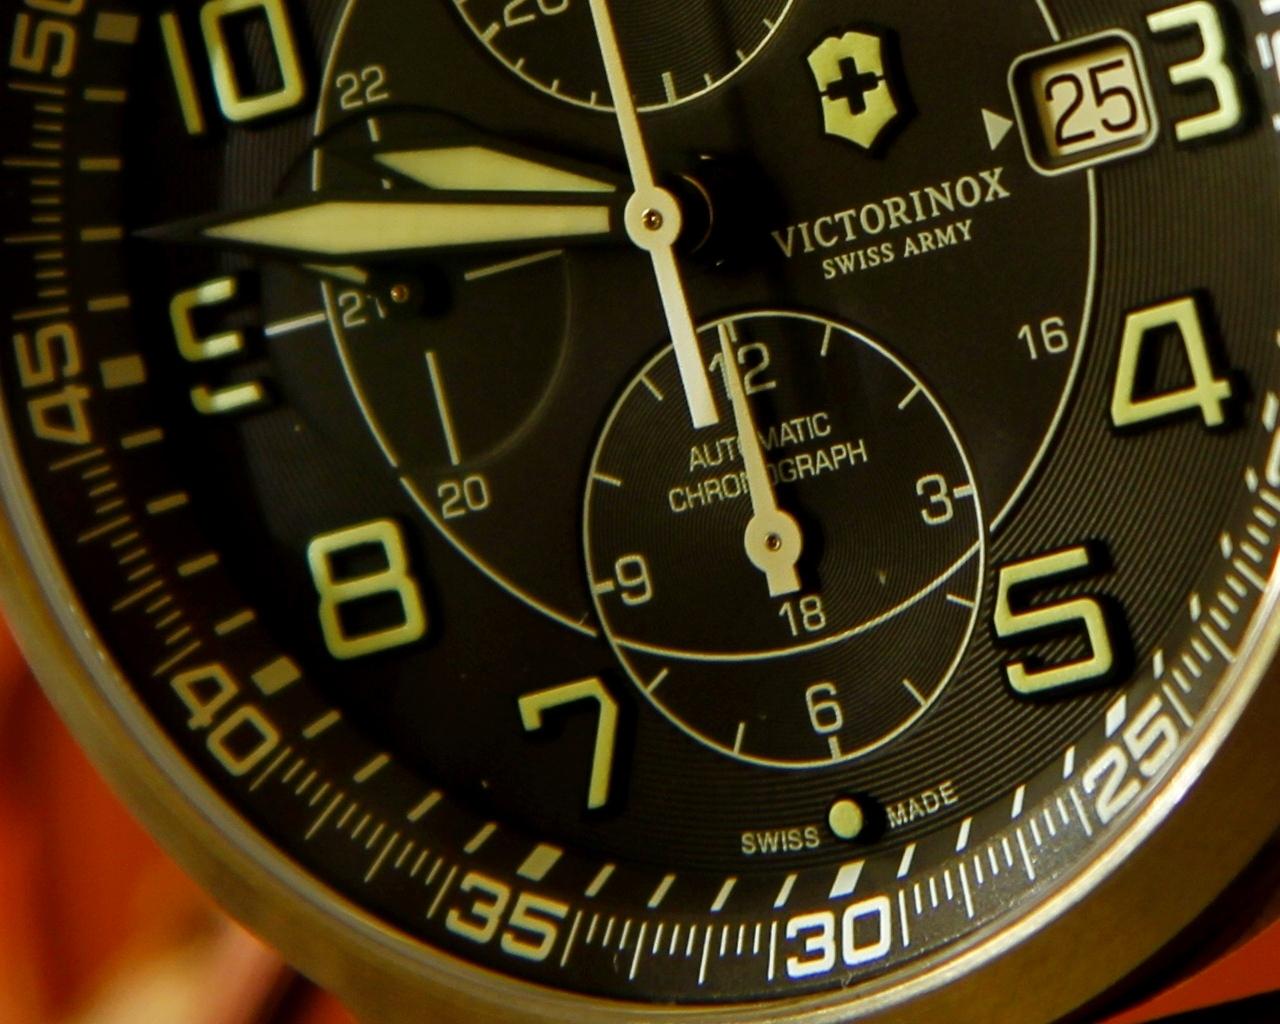 watch-test-victorinox-swiss-army-chronograph-automatic-prezzo-price-0-100_36